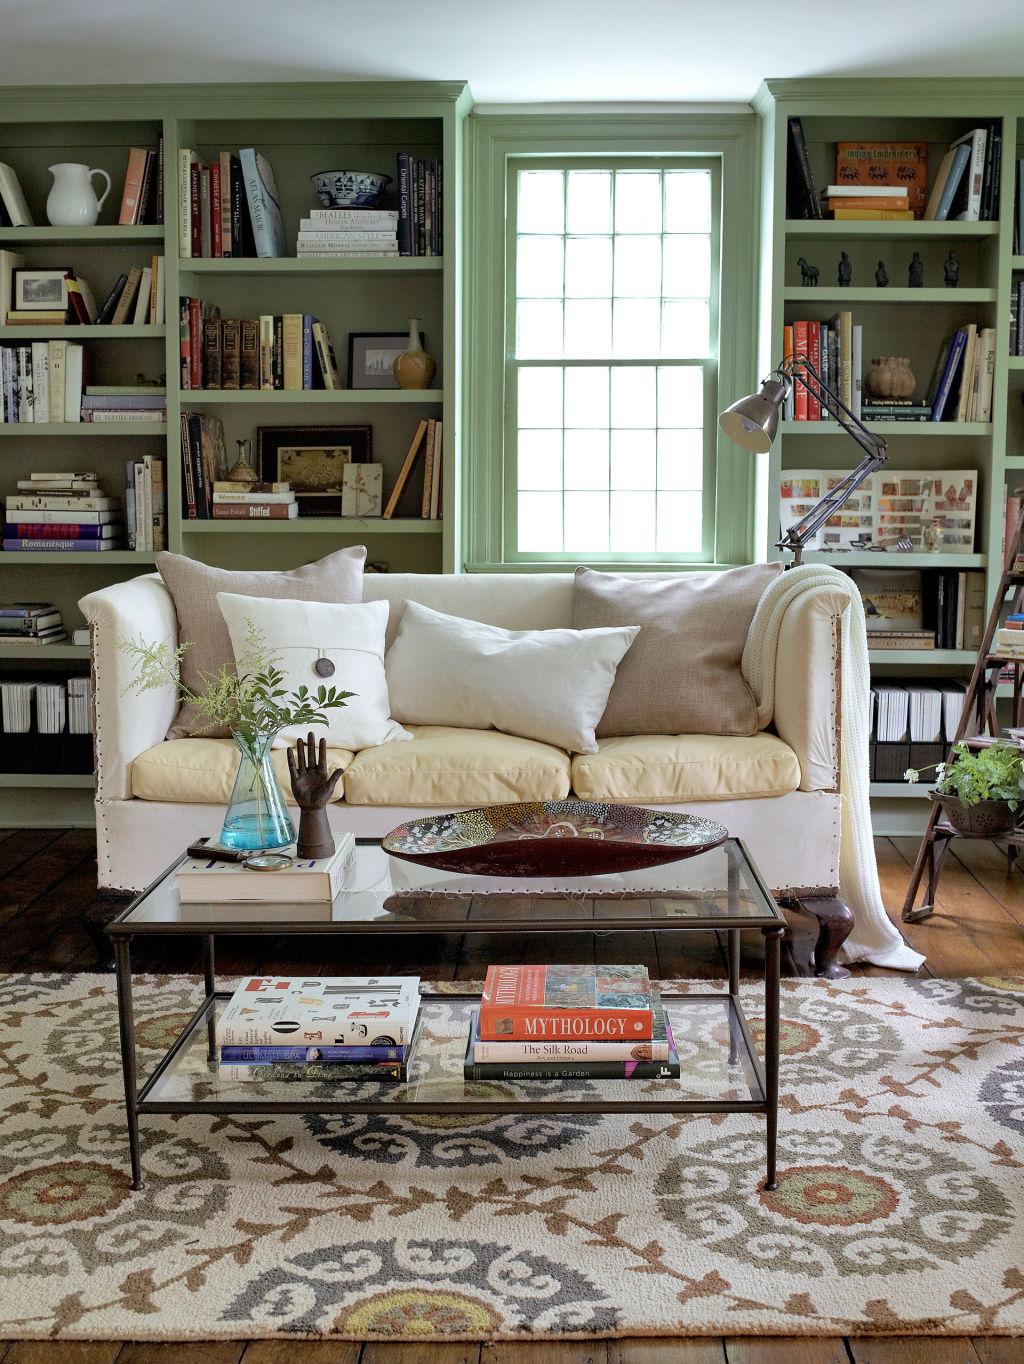 Ellen allen connecticut farmhouse farmhouse decorating ideas for Bookshelf ideas in living room